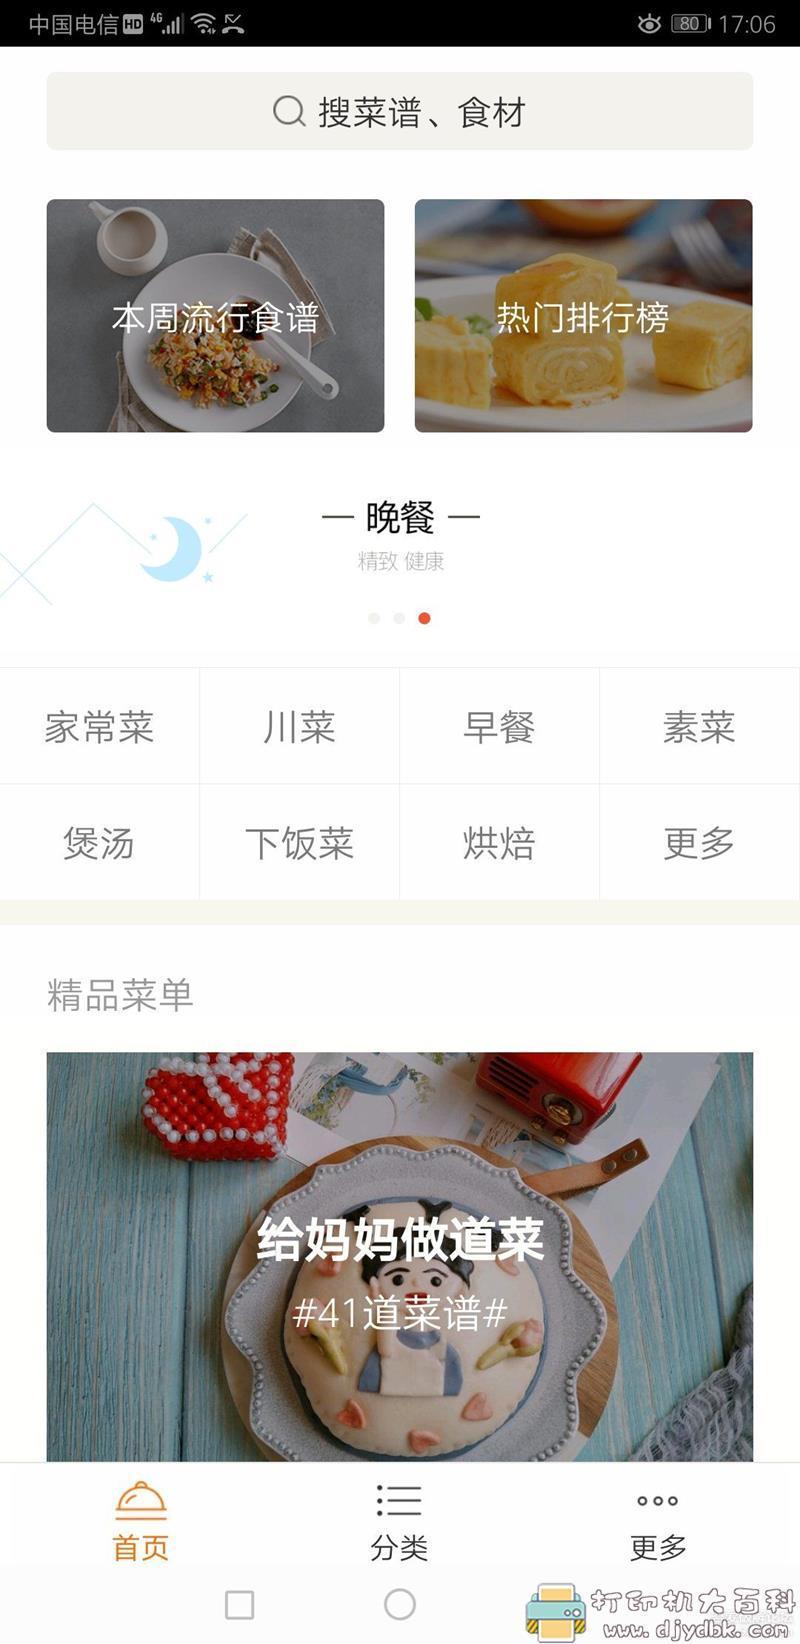 [Android]香哈菜谱6.1.0谷歌市场最新版 配图 No.1